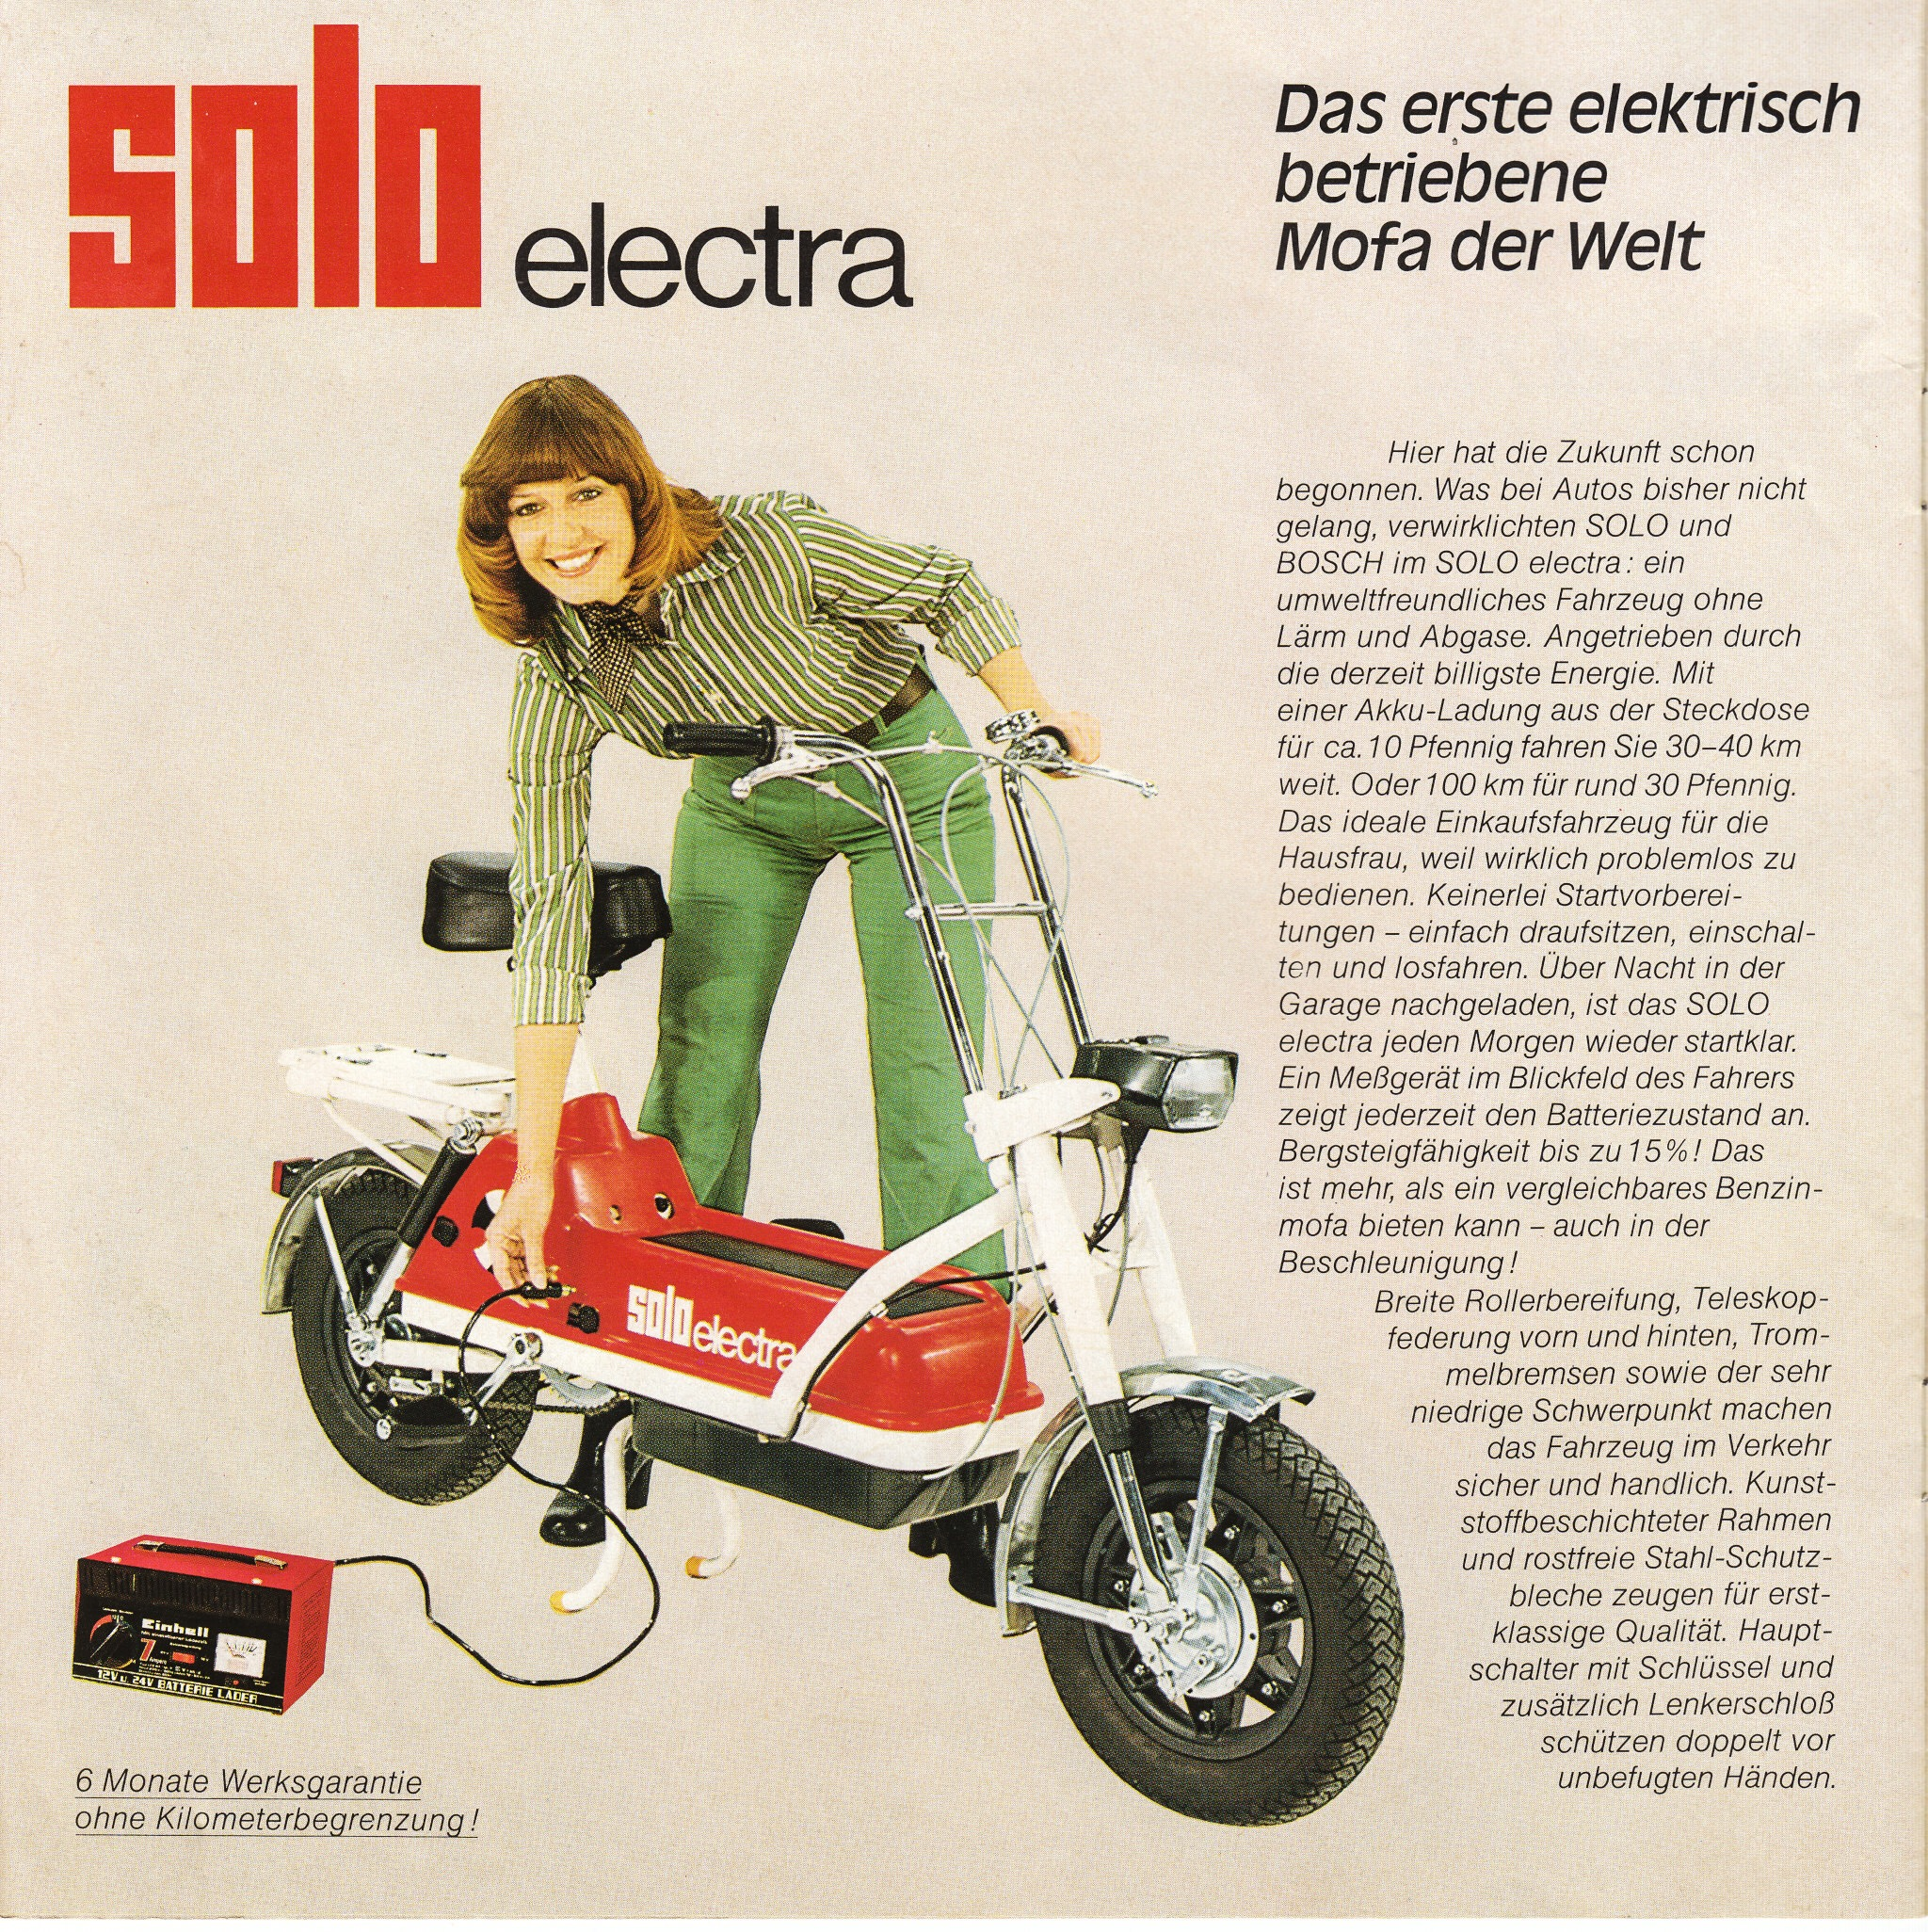 Solo Electra – wie jetzt?